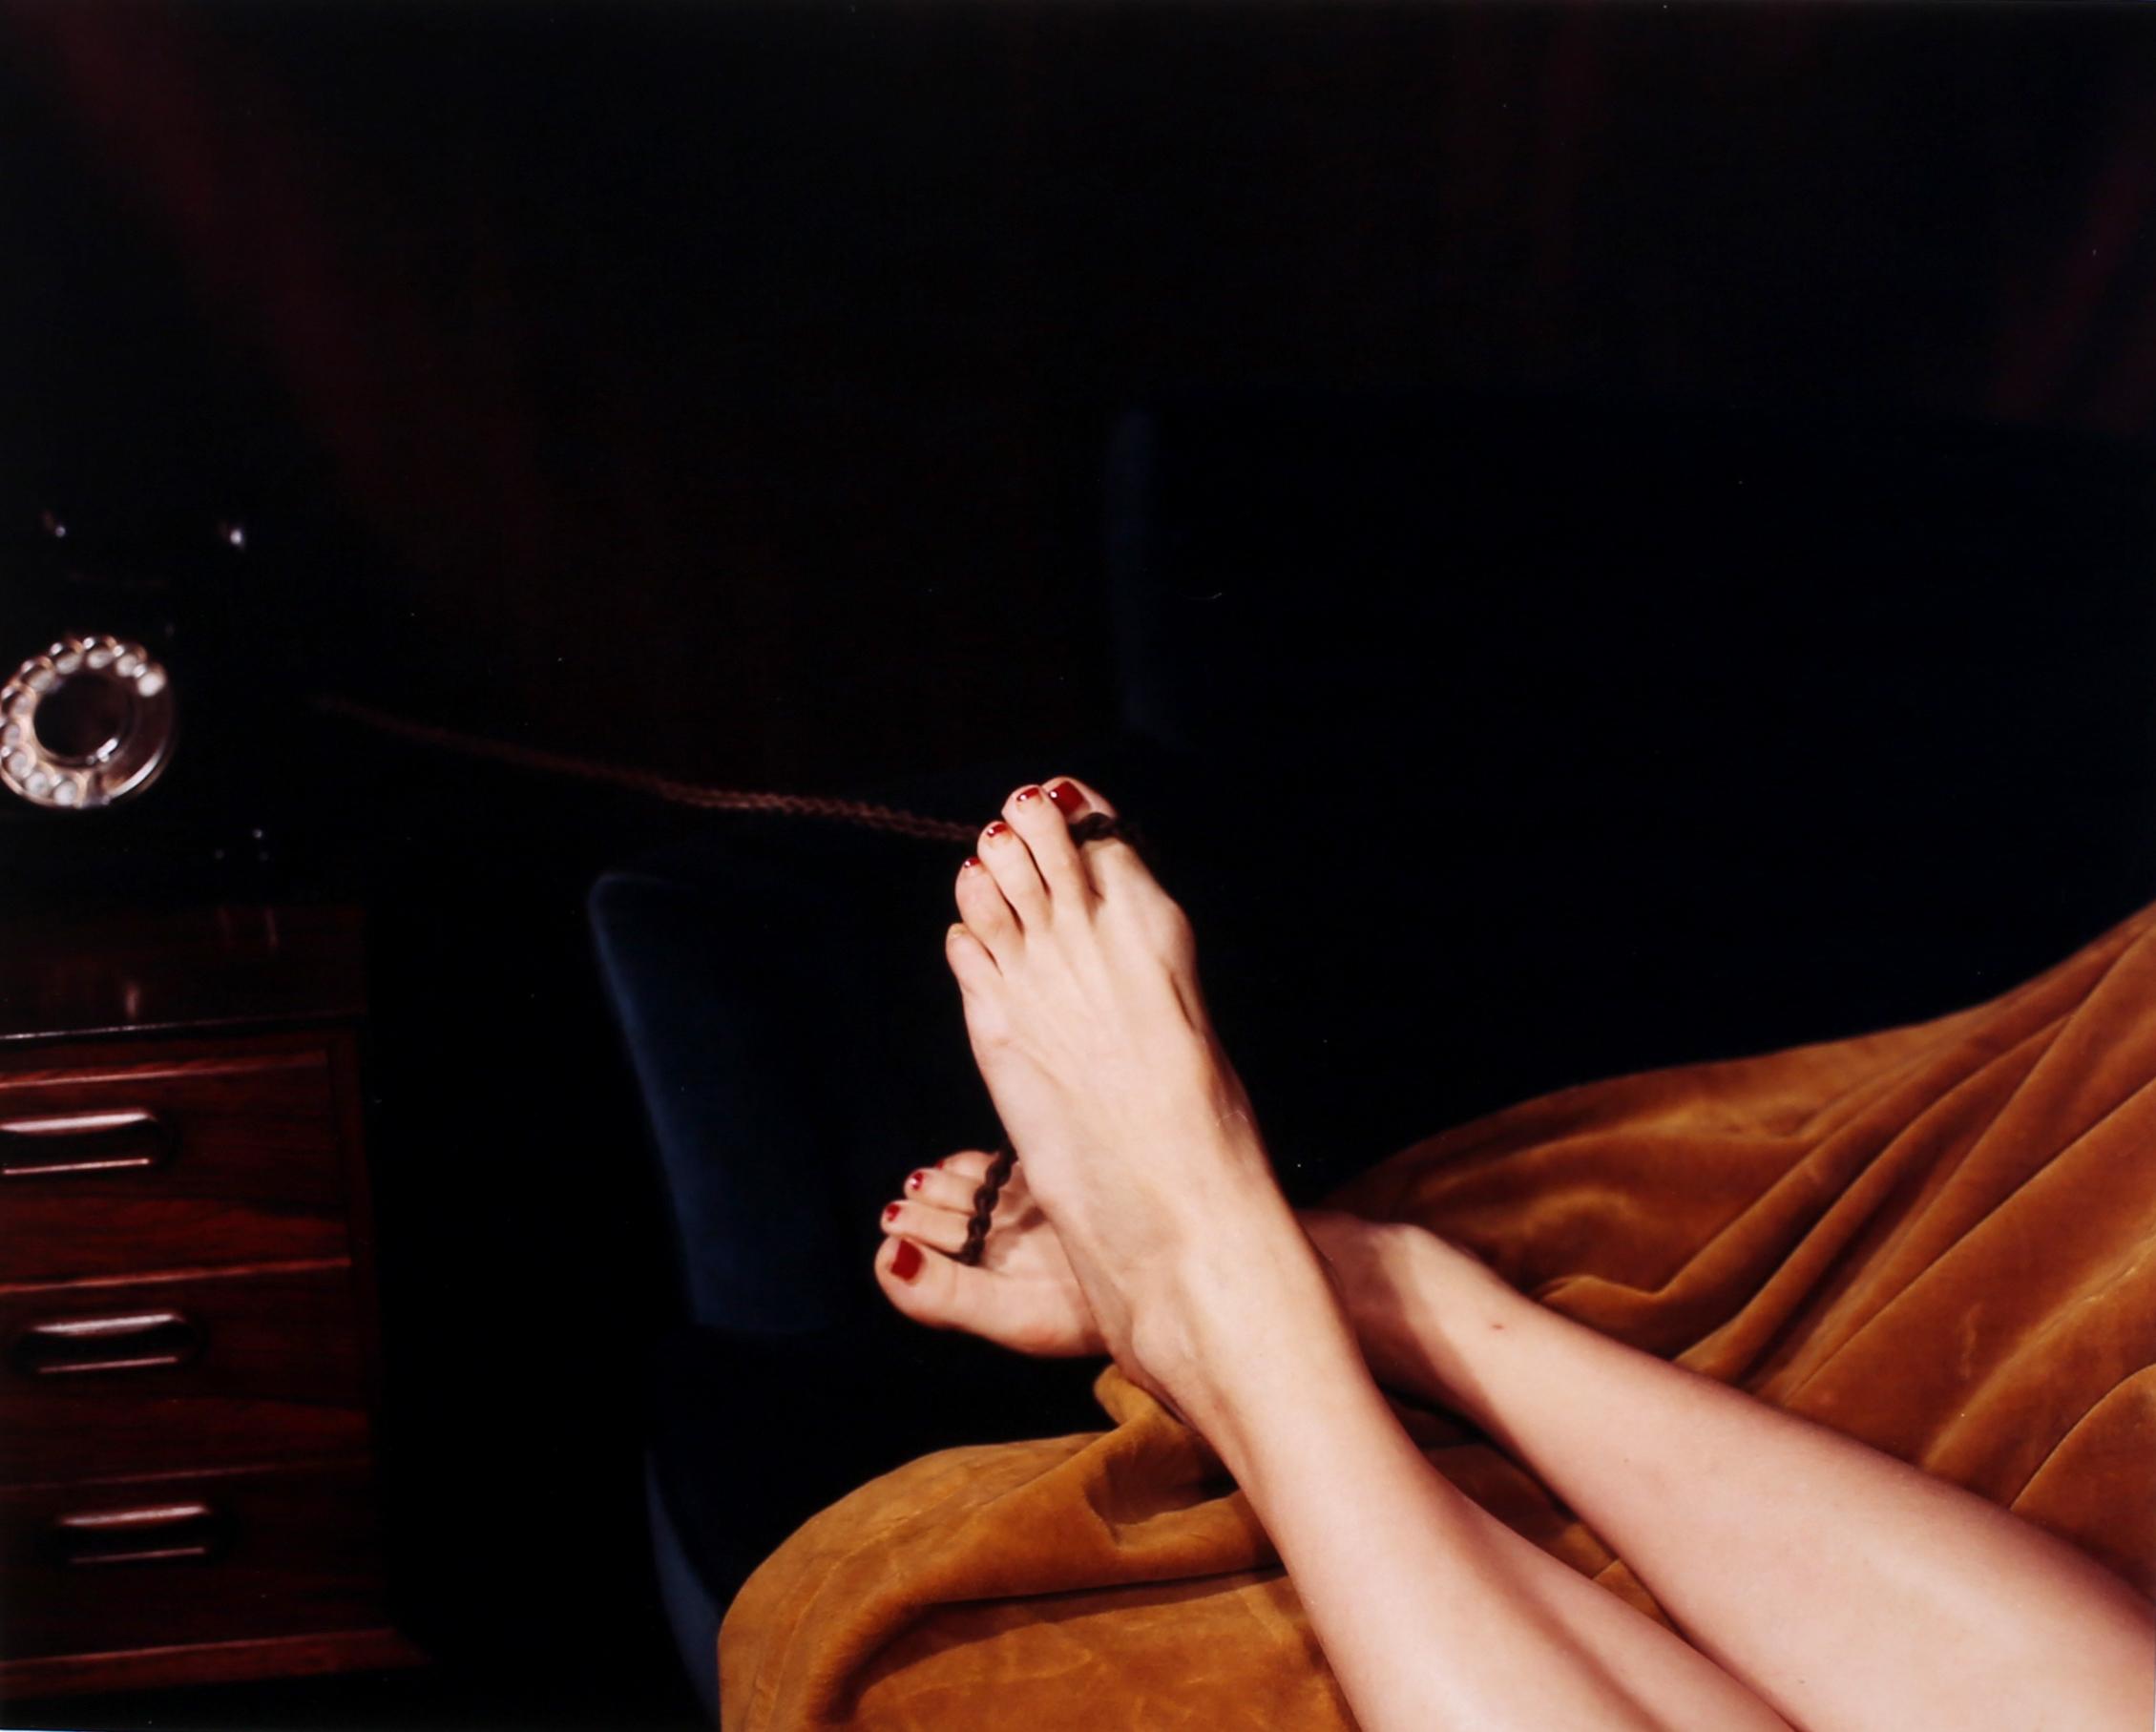 feet01.jpg